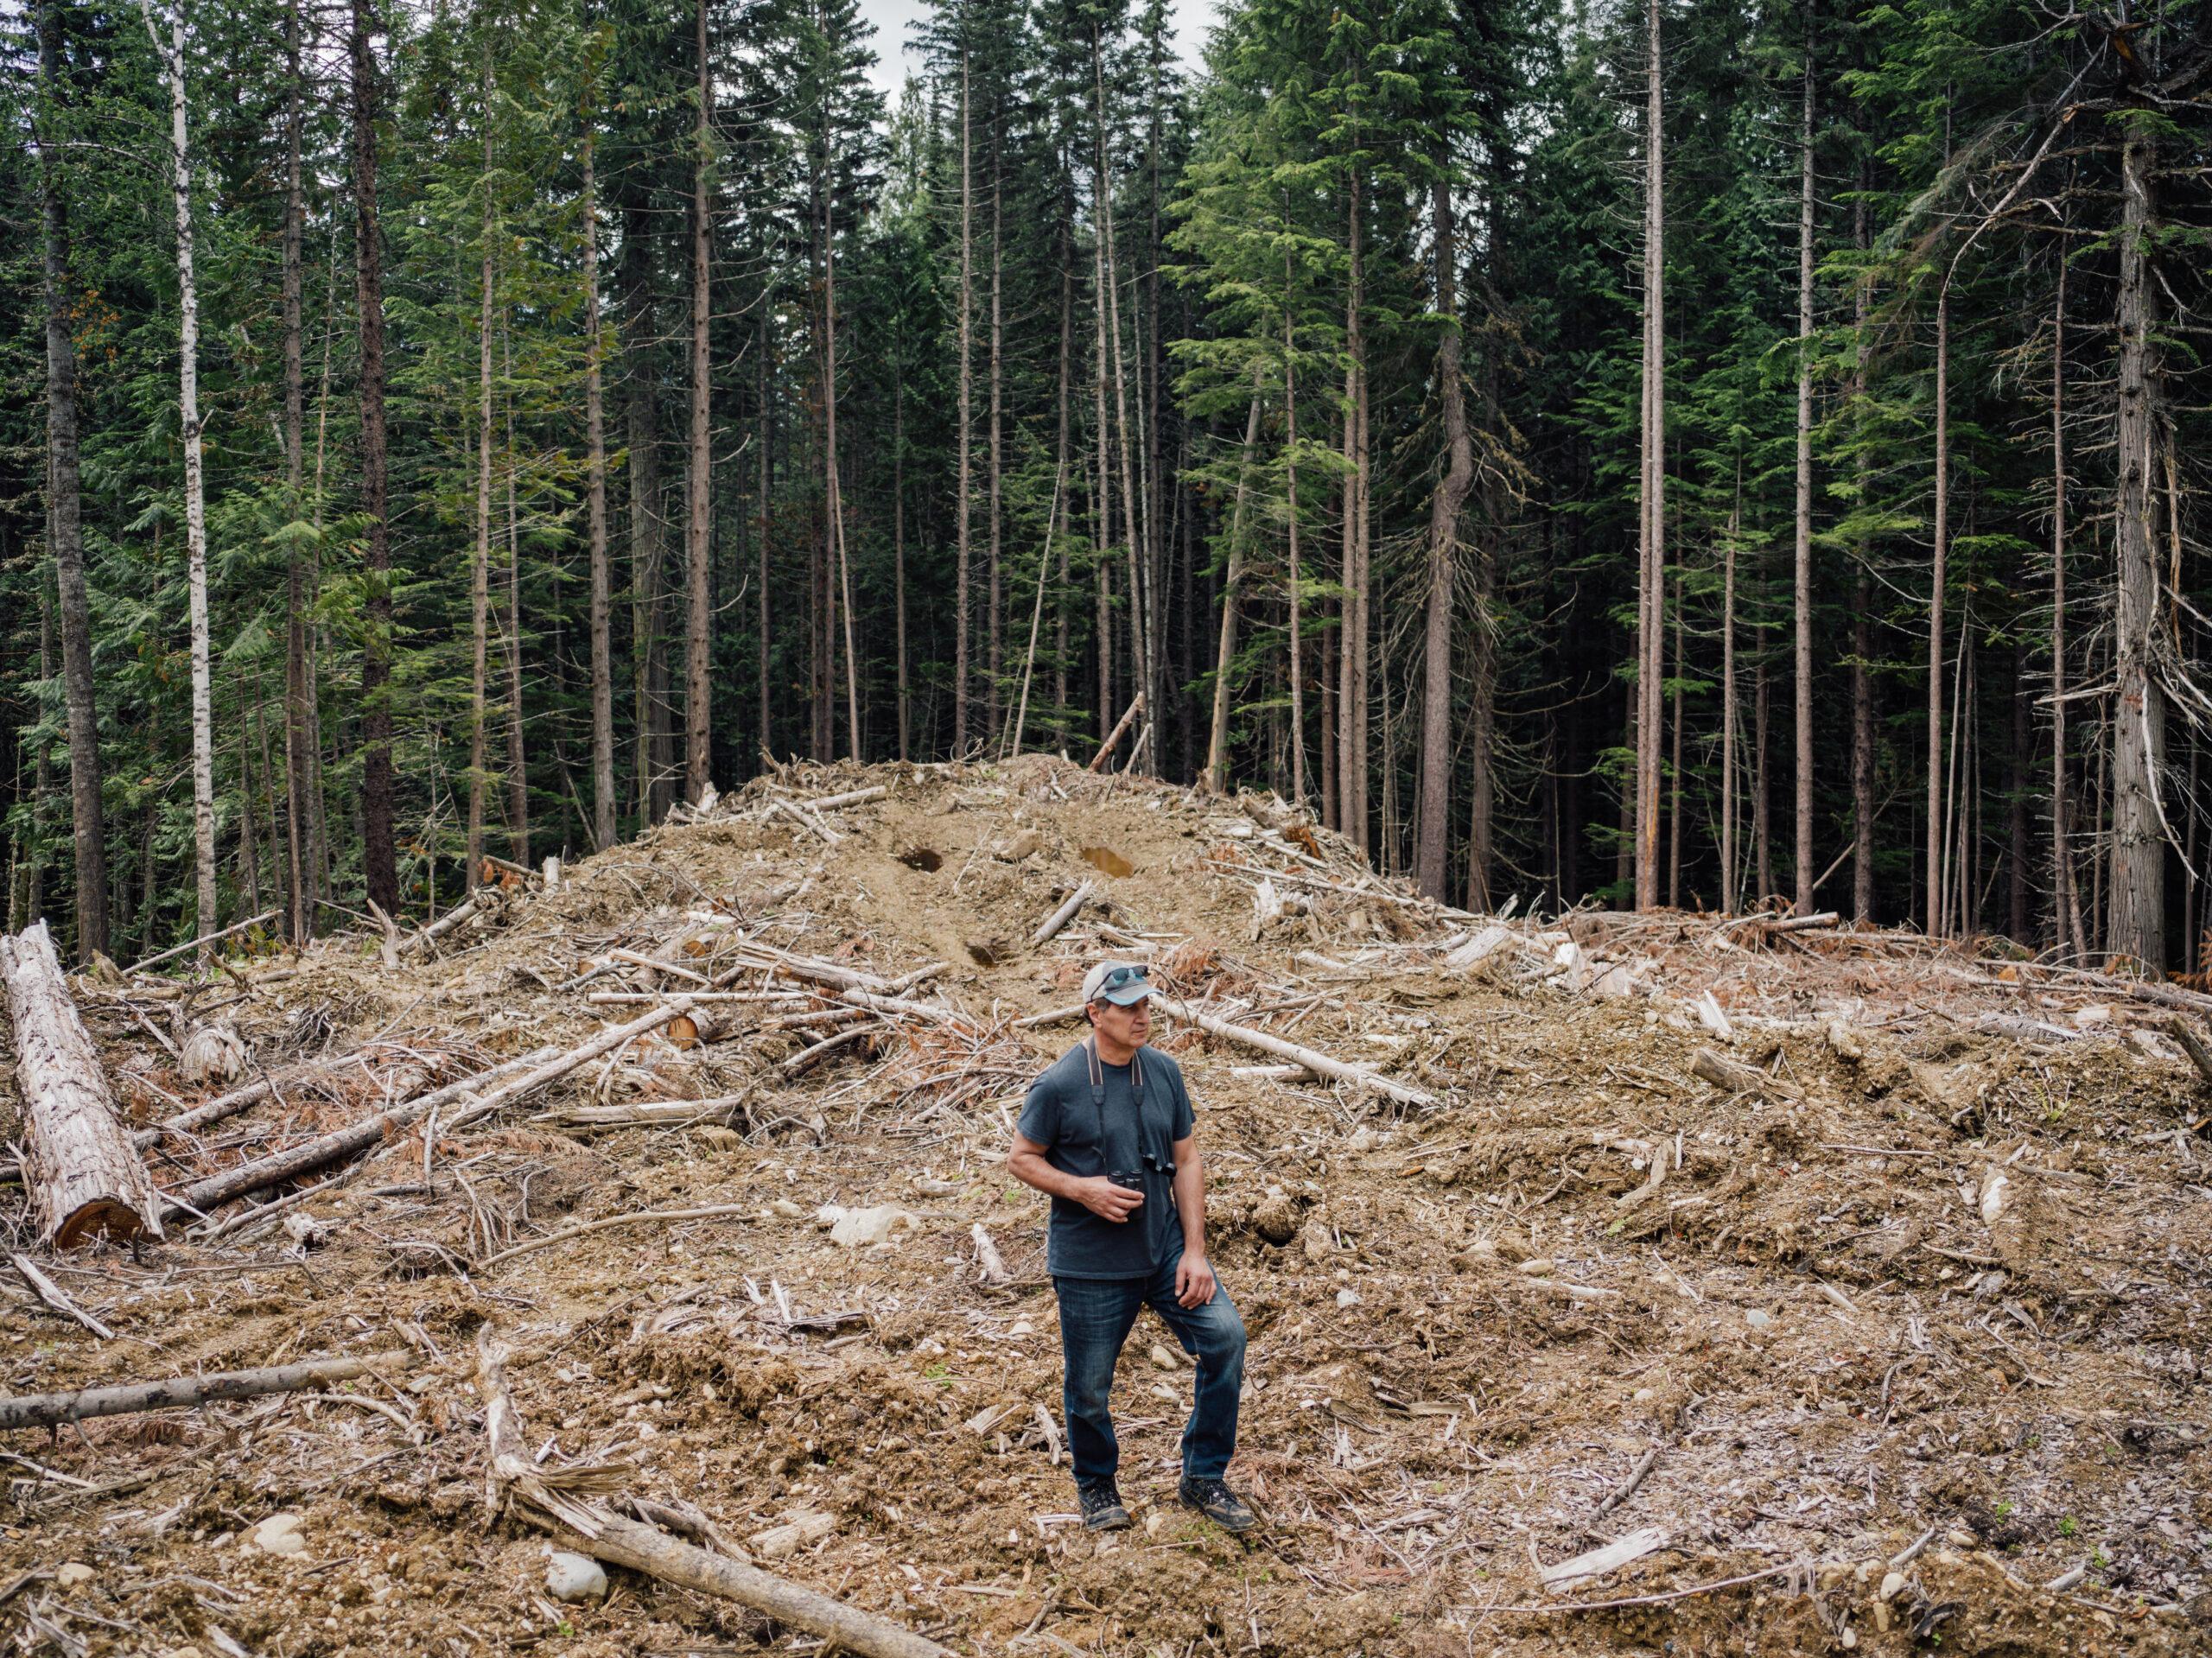 Dominick DellaSala Inland-Temperate-Rainforest-TheNarwhal-0015